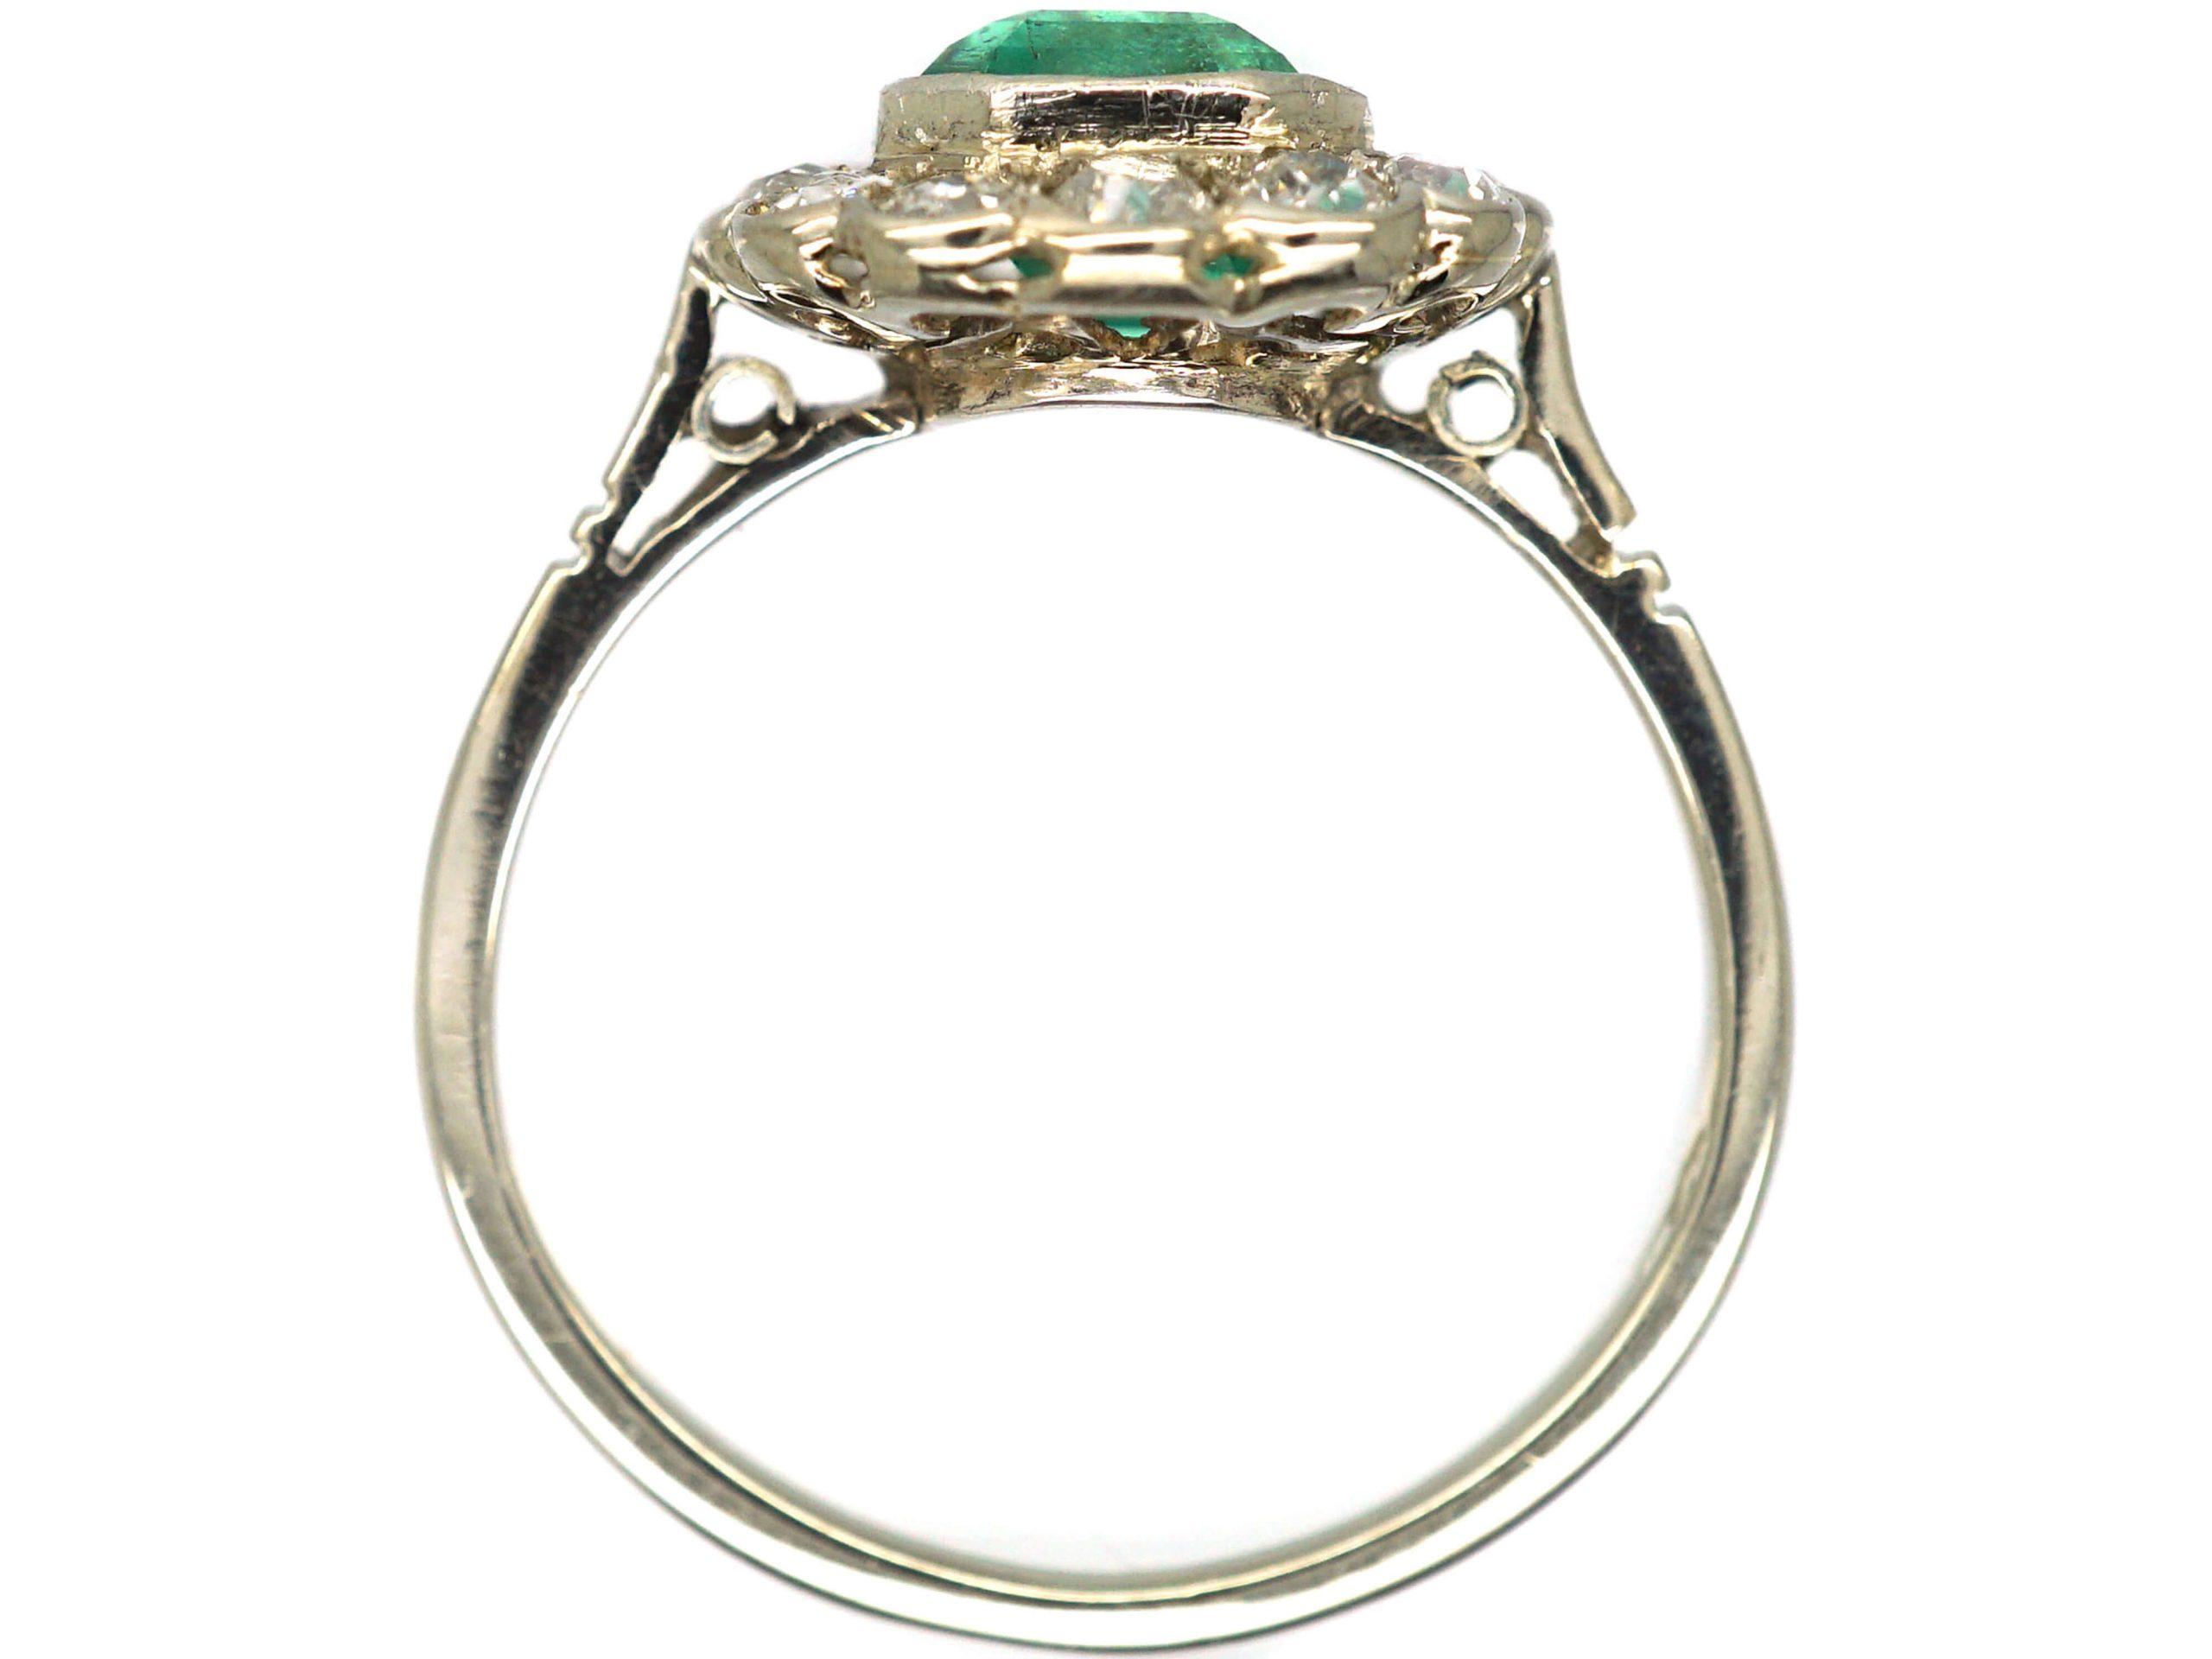 Art Deco 14ct White Gold, Emerald & Diamond Cluster Ring